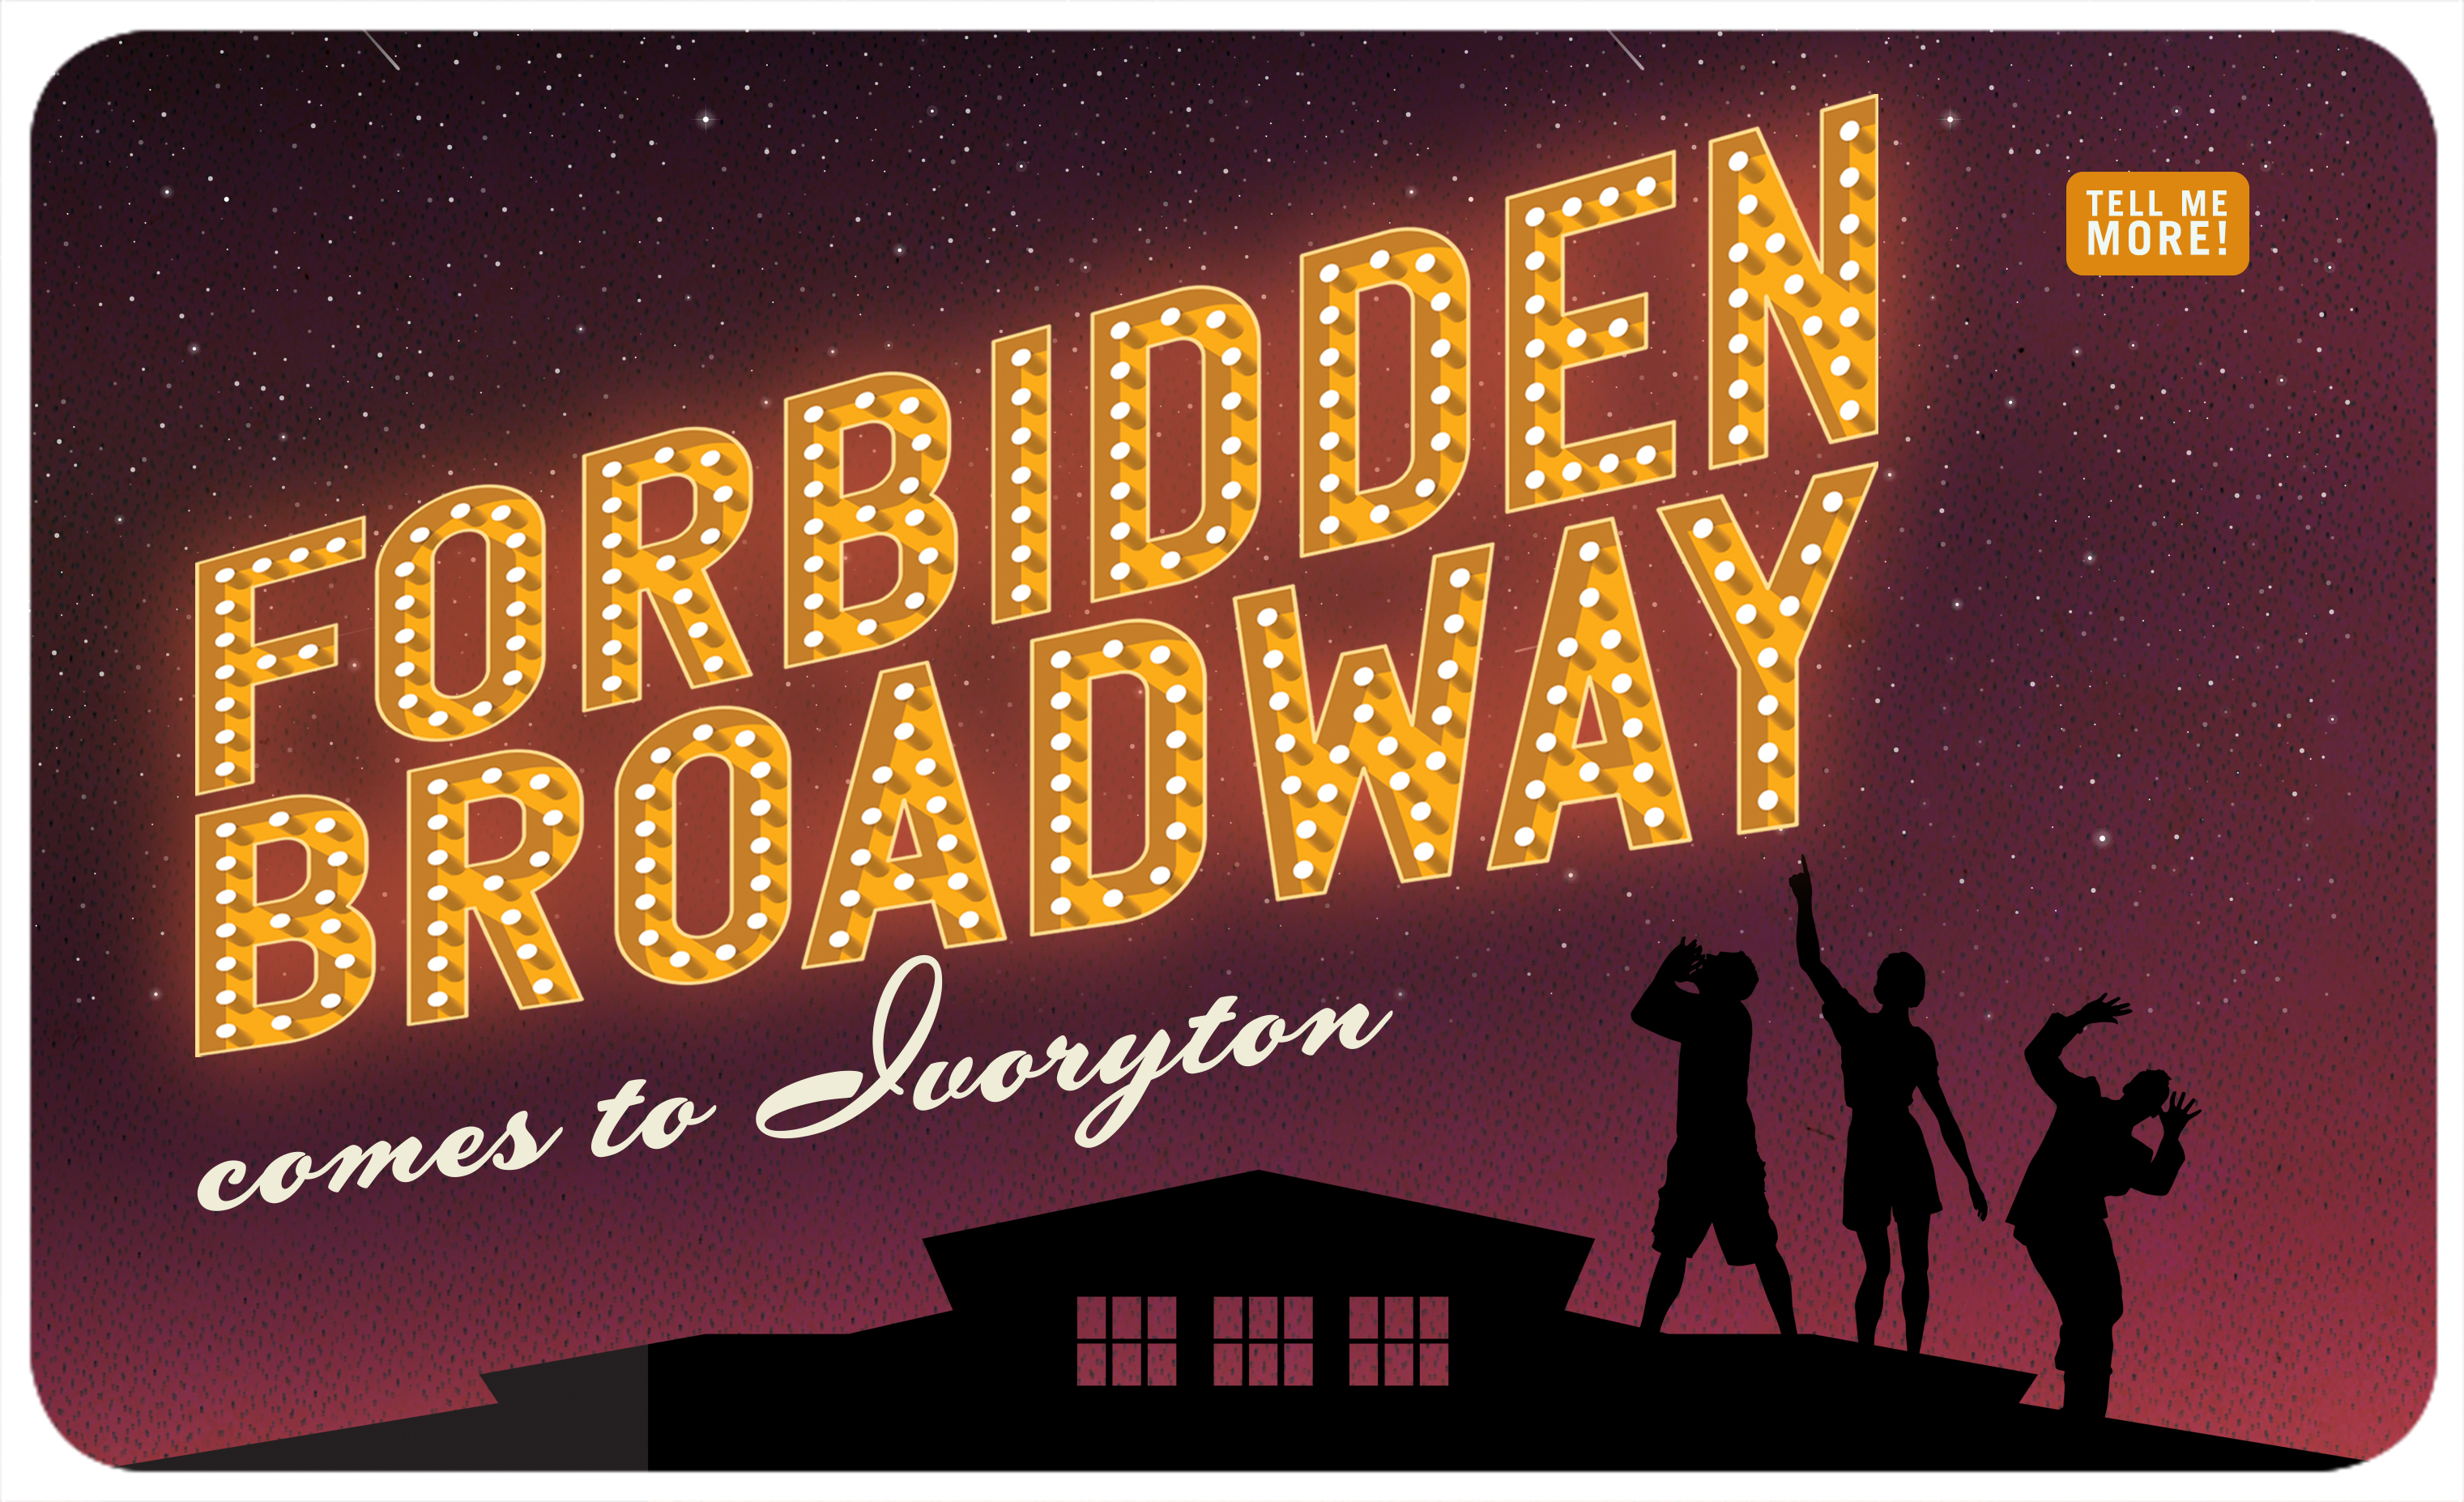 Forbidden Broadway Comes to Ivoryton